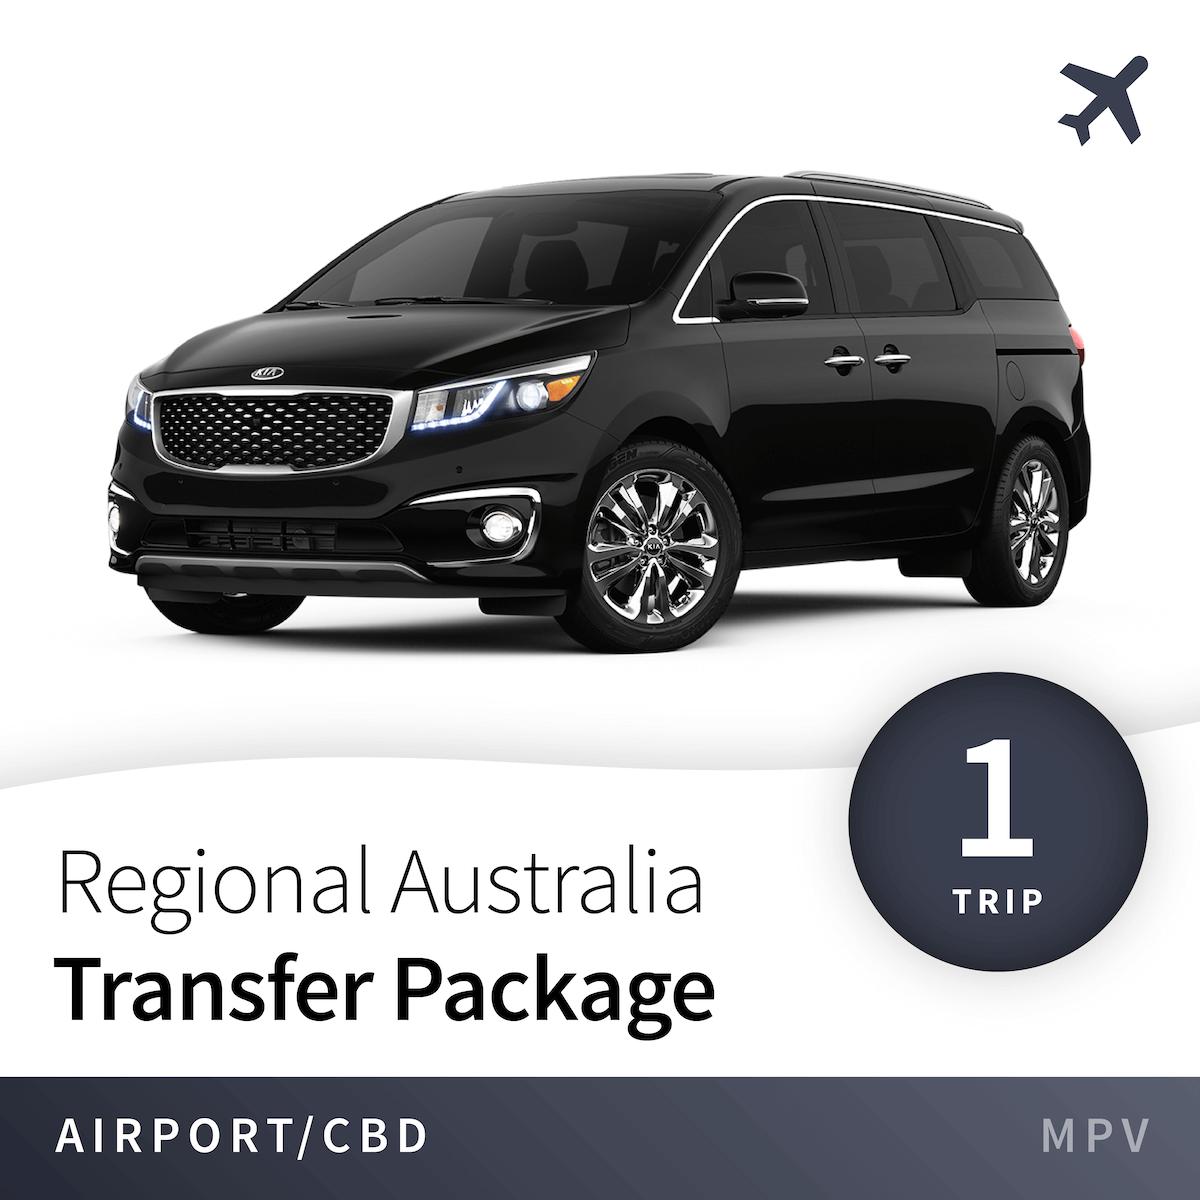 Regional Airport Transfer Package - MPV (1 Trip) 17